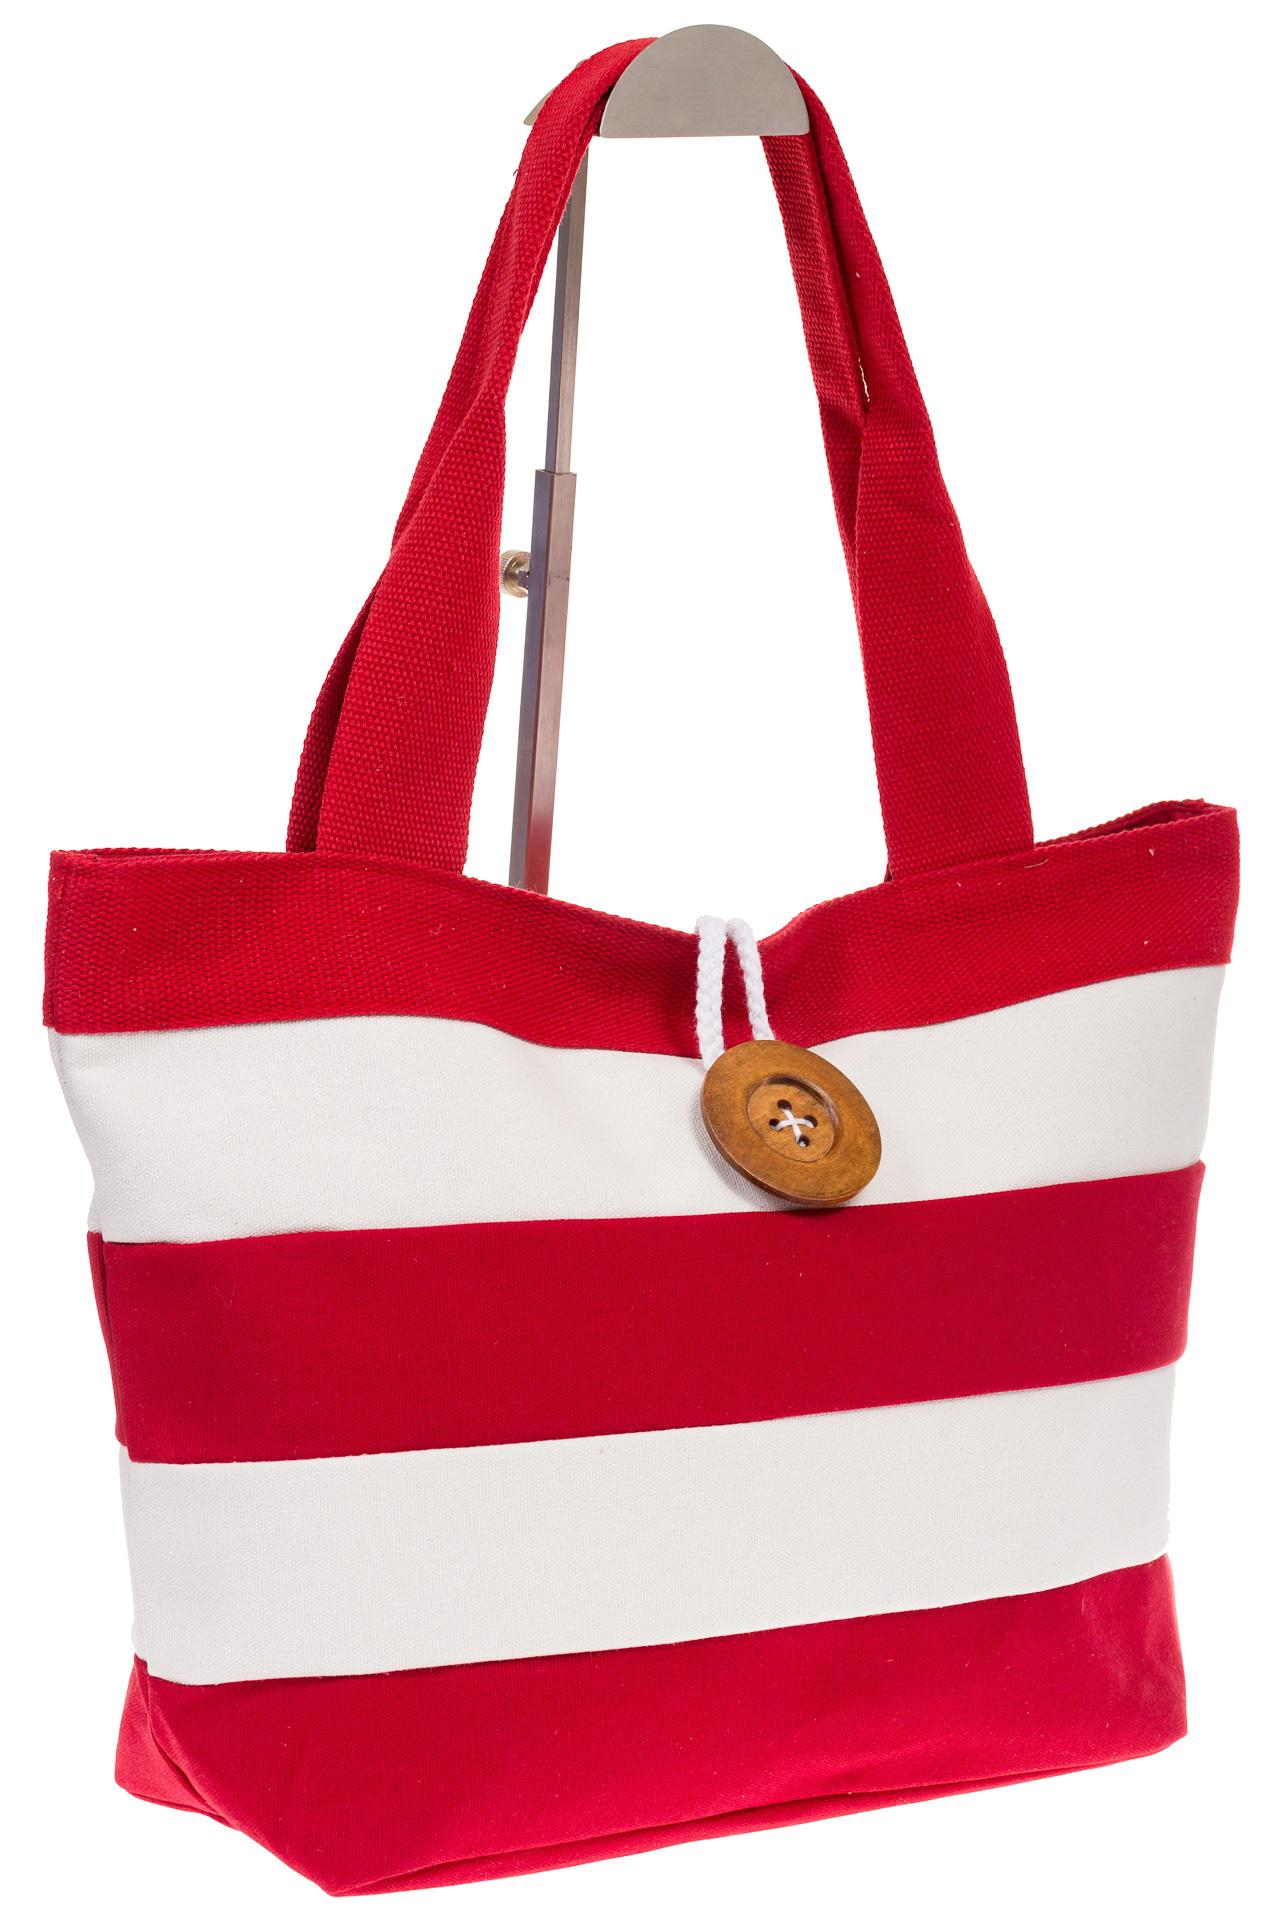 на фото Пляжная сумка в красно-белую полоску 6216